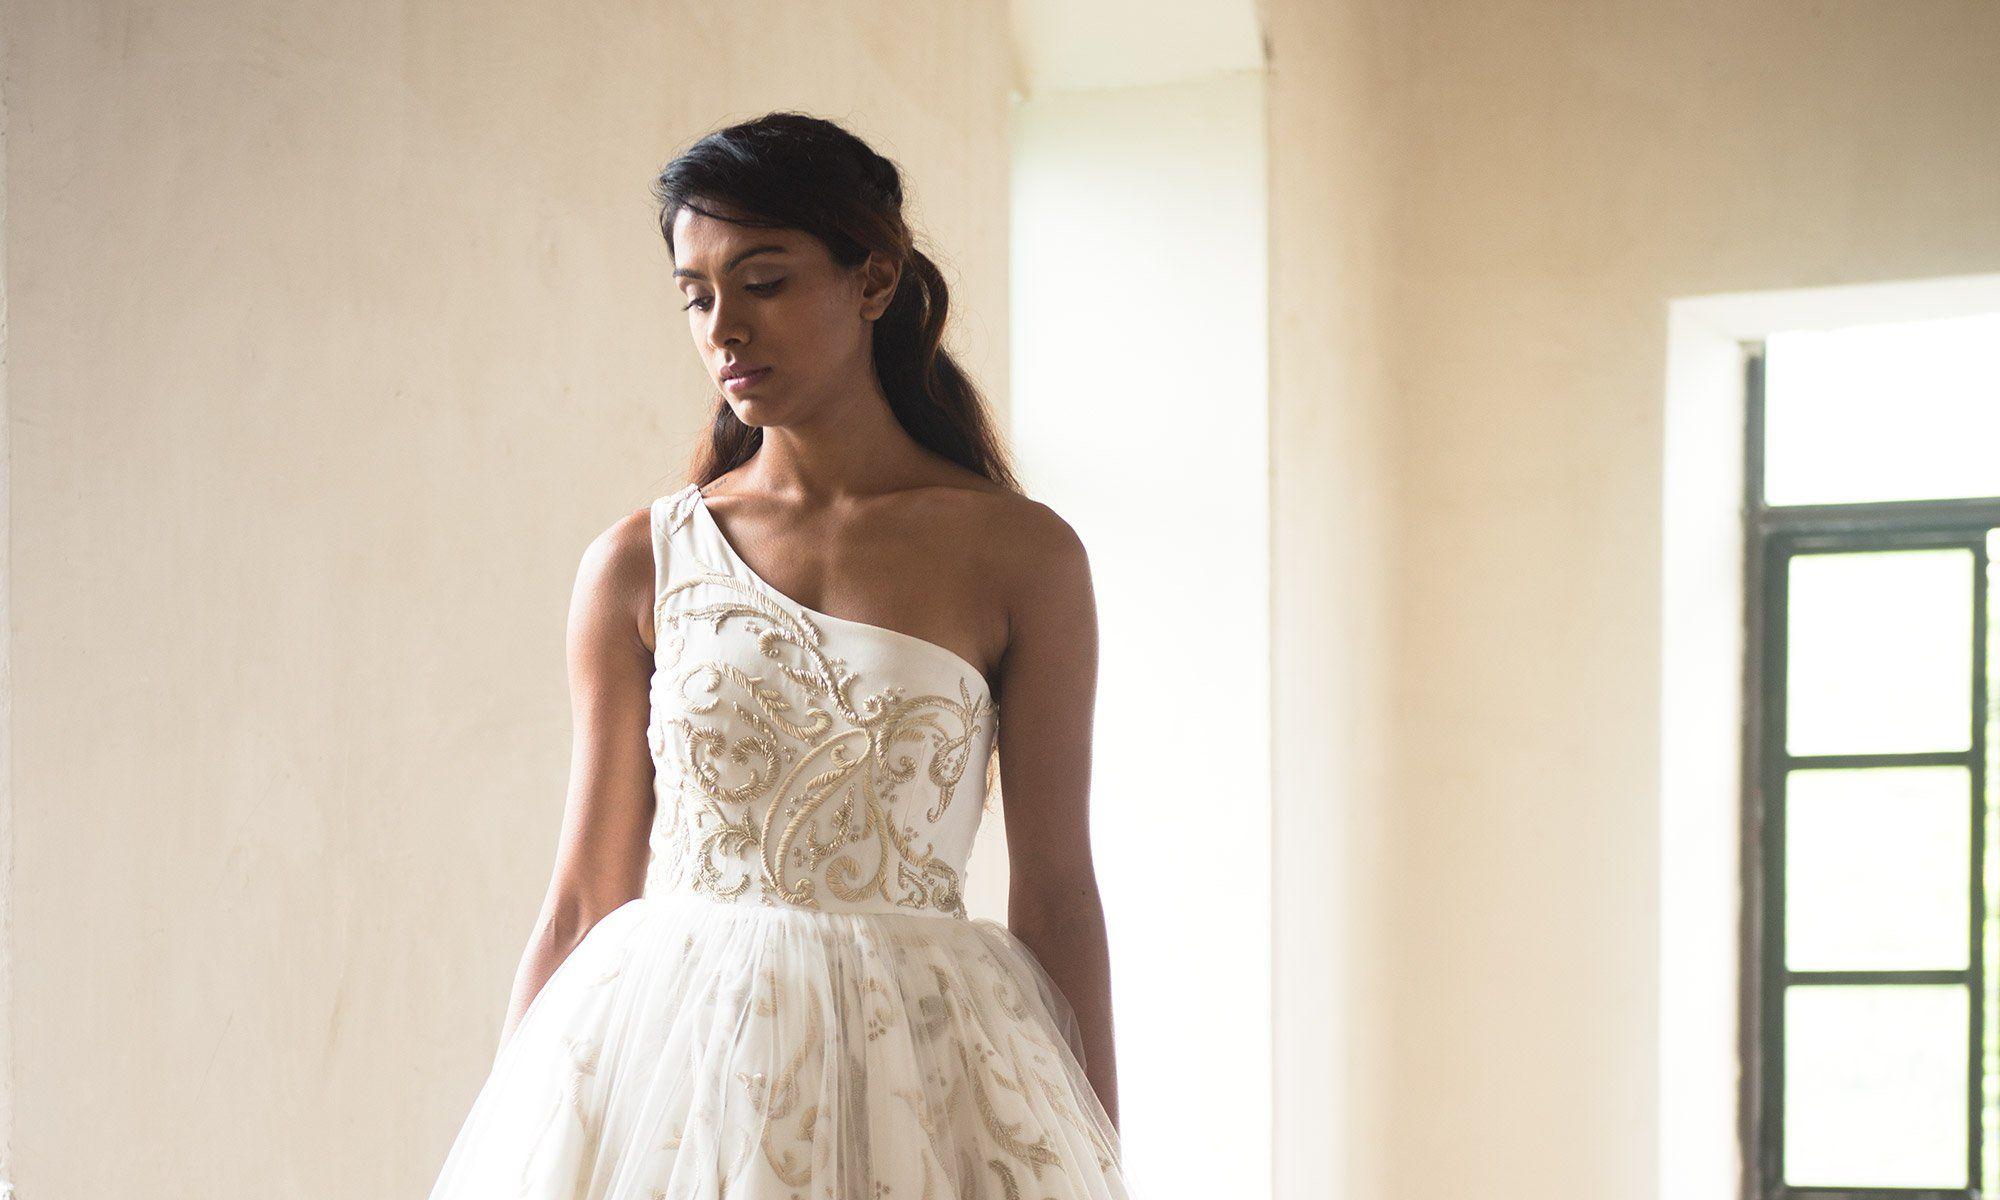 Indian wedding dress DESIGNER website. Indian wedding